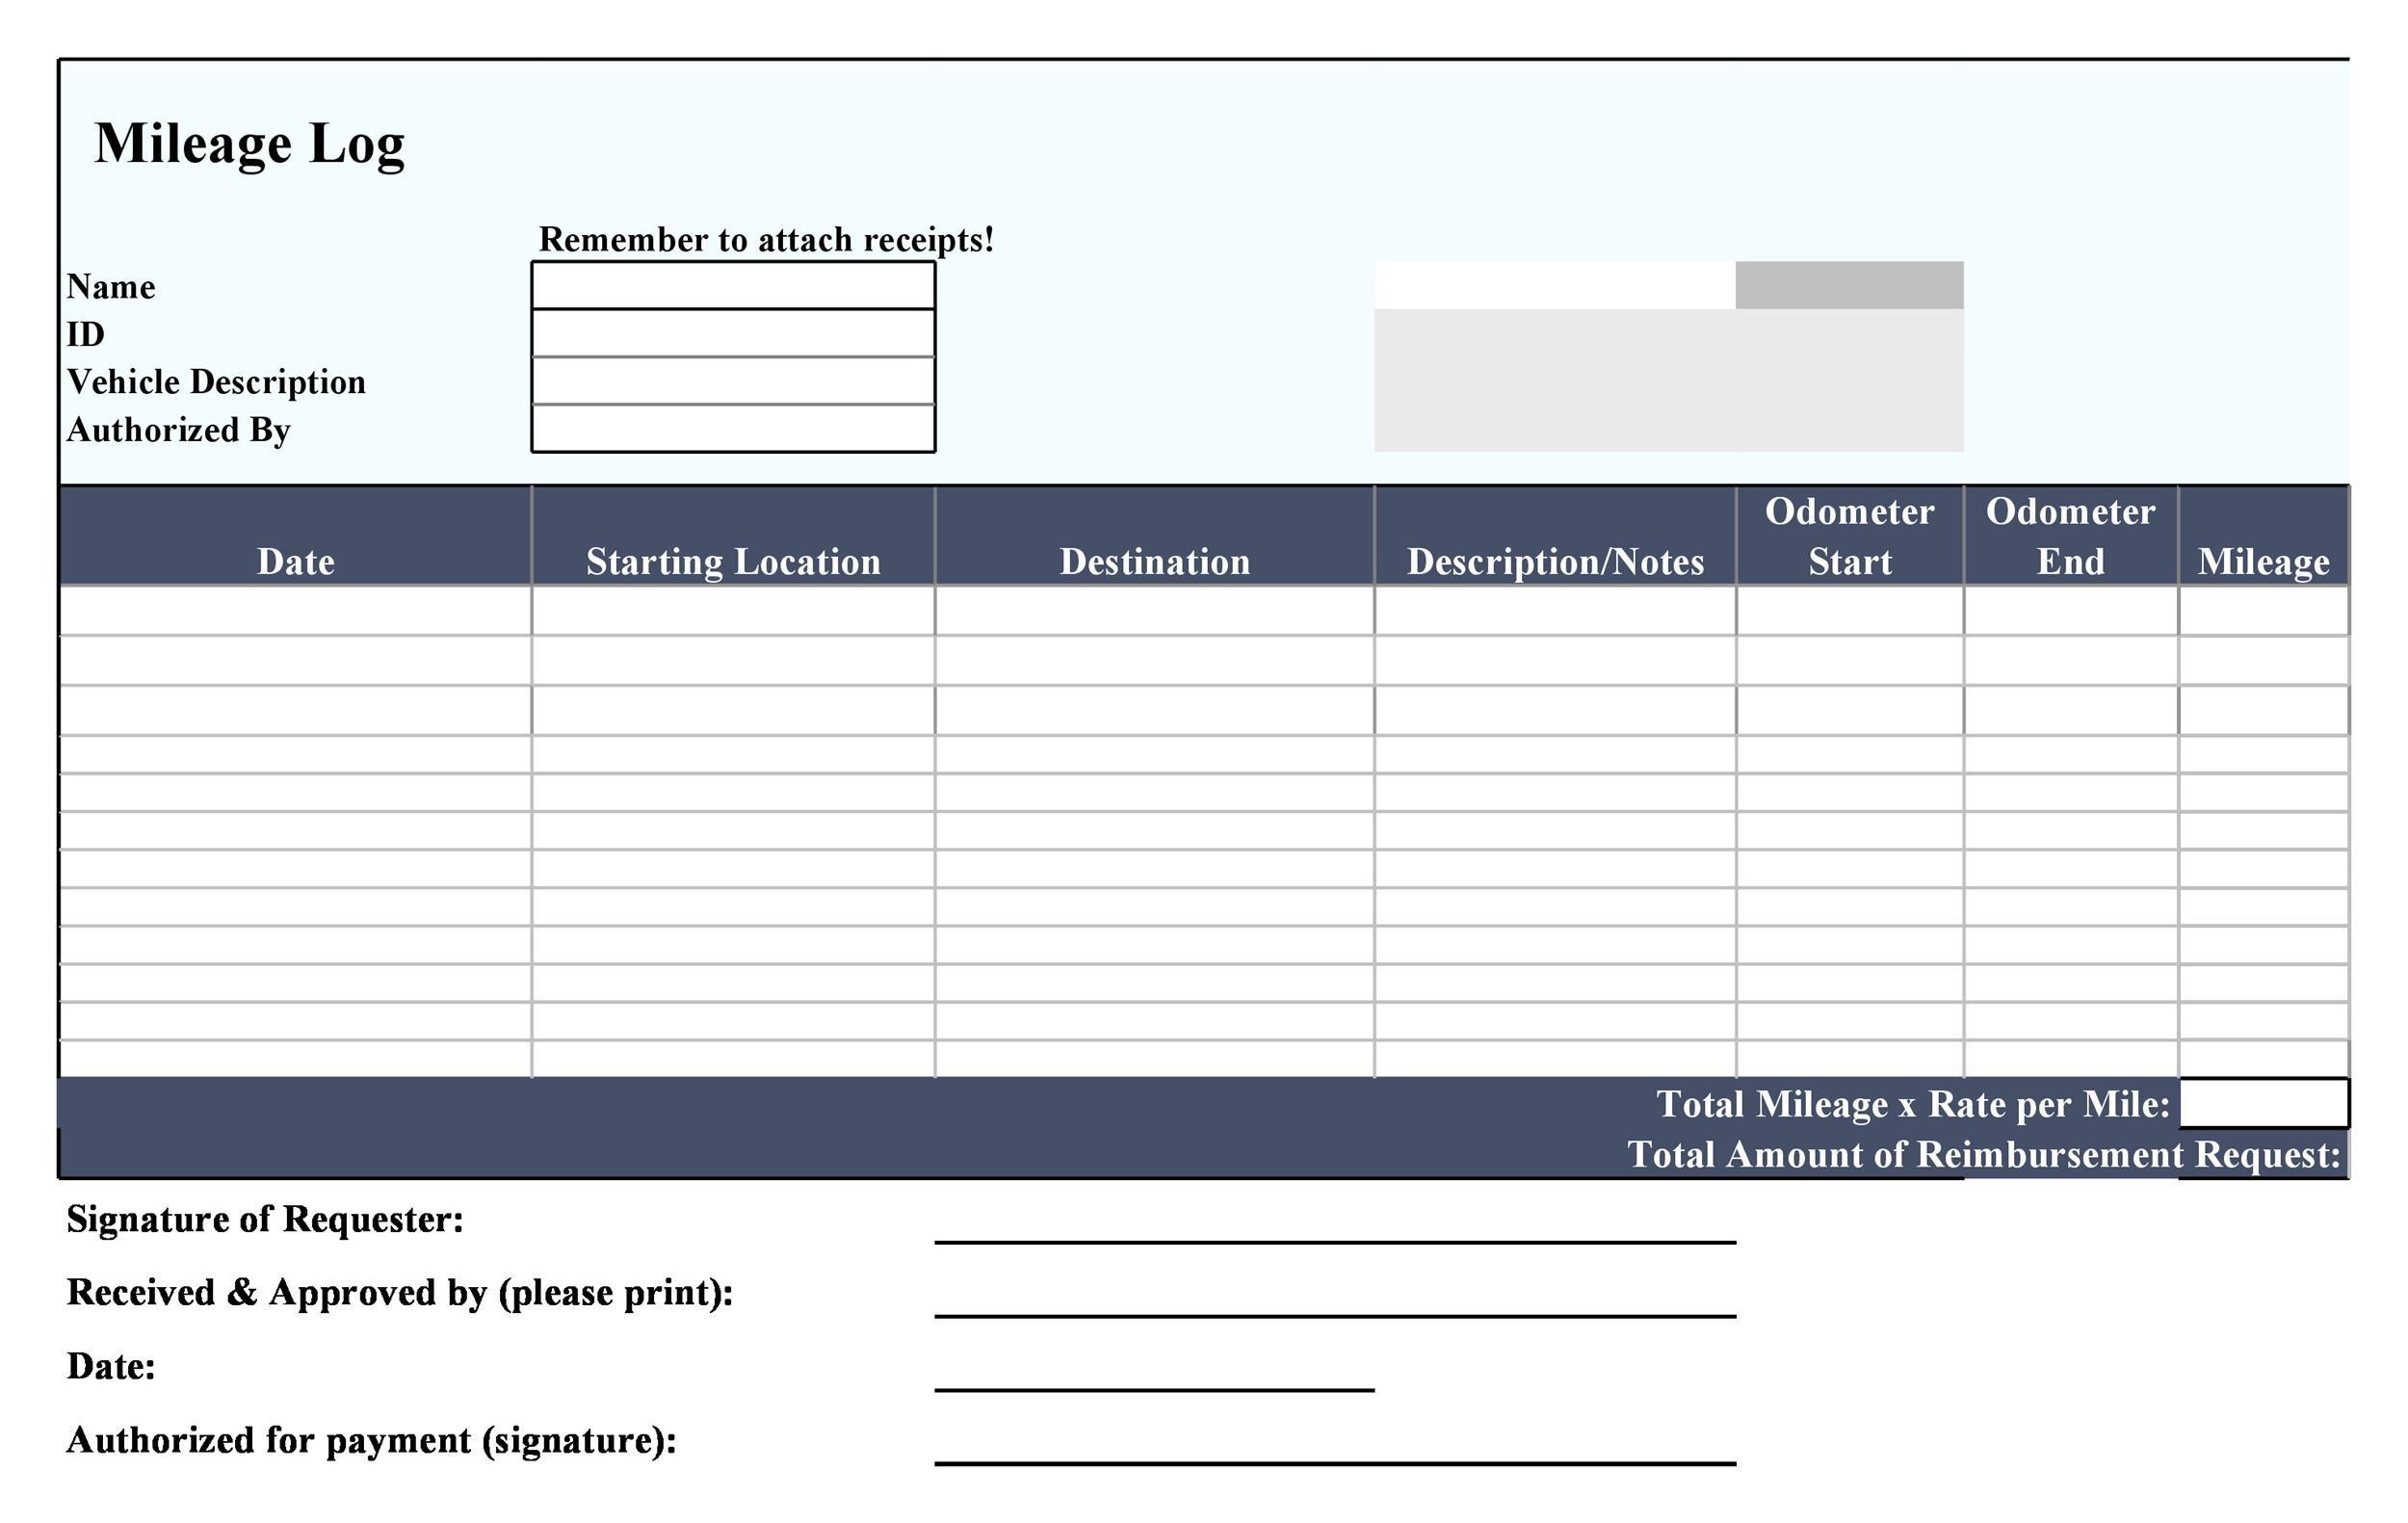 30 Printable Mileage Log Templates (Free) - Template Lab